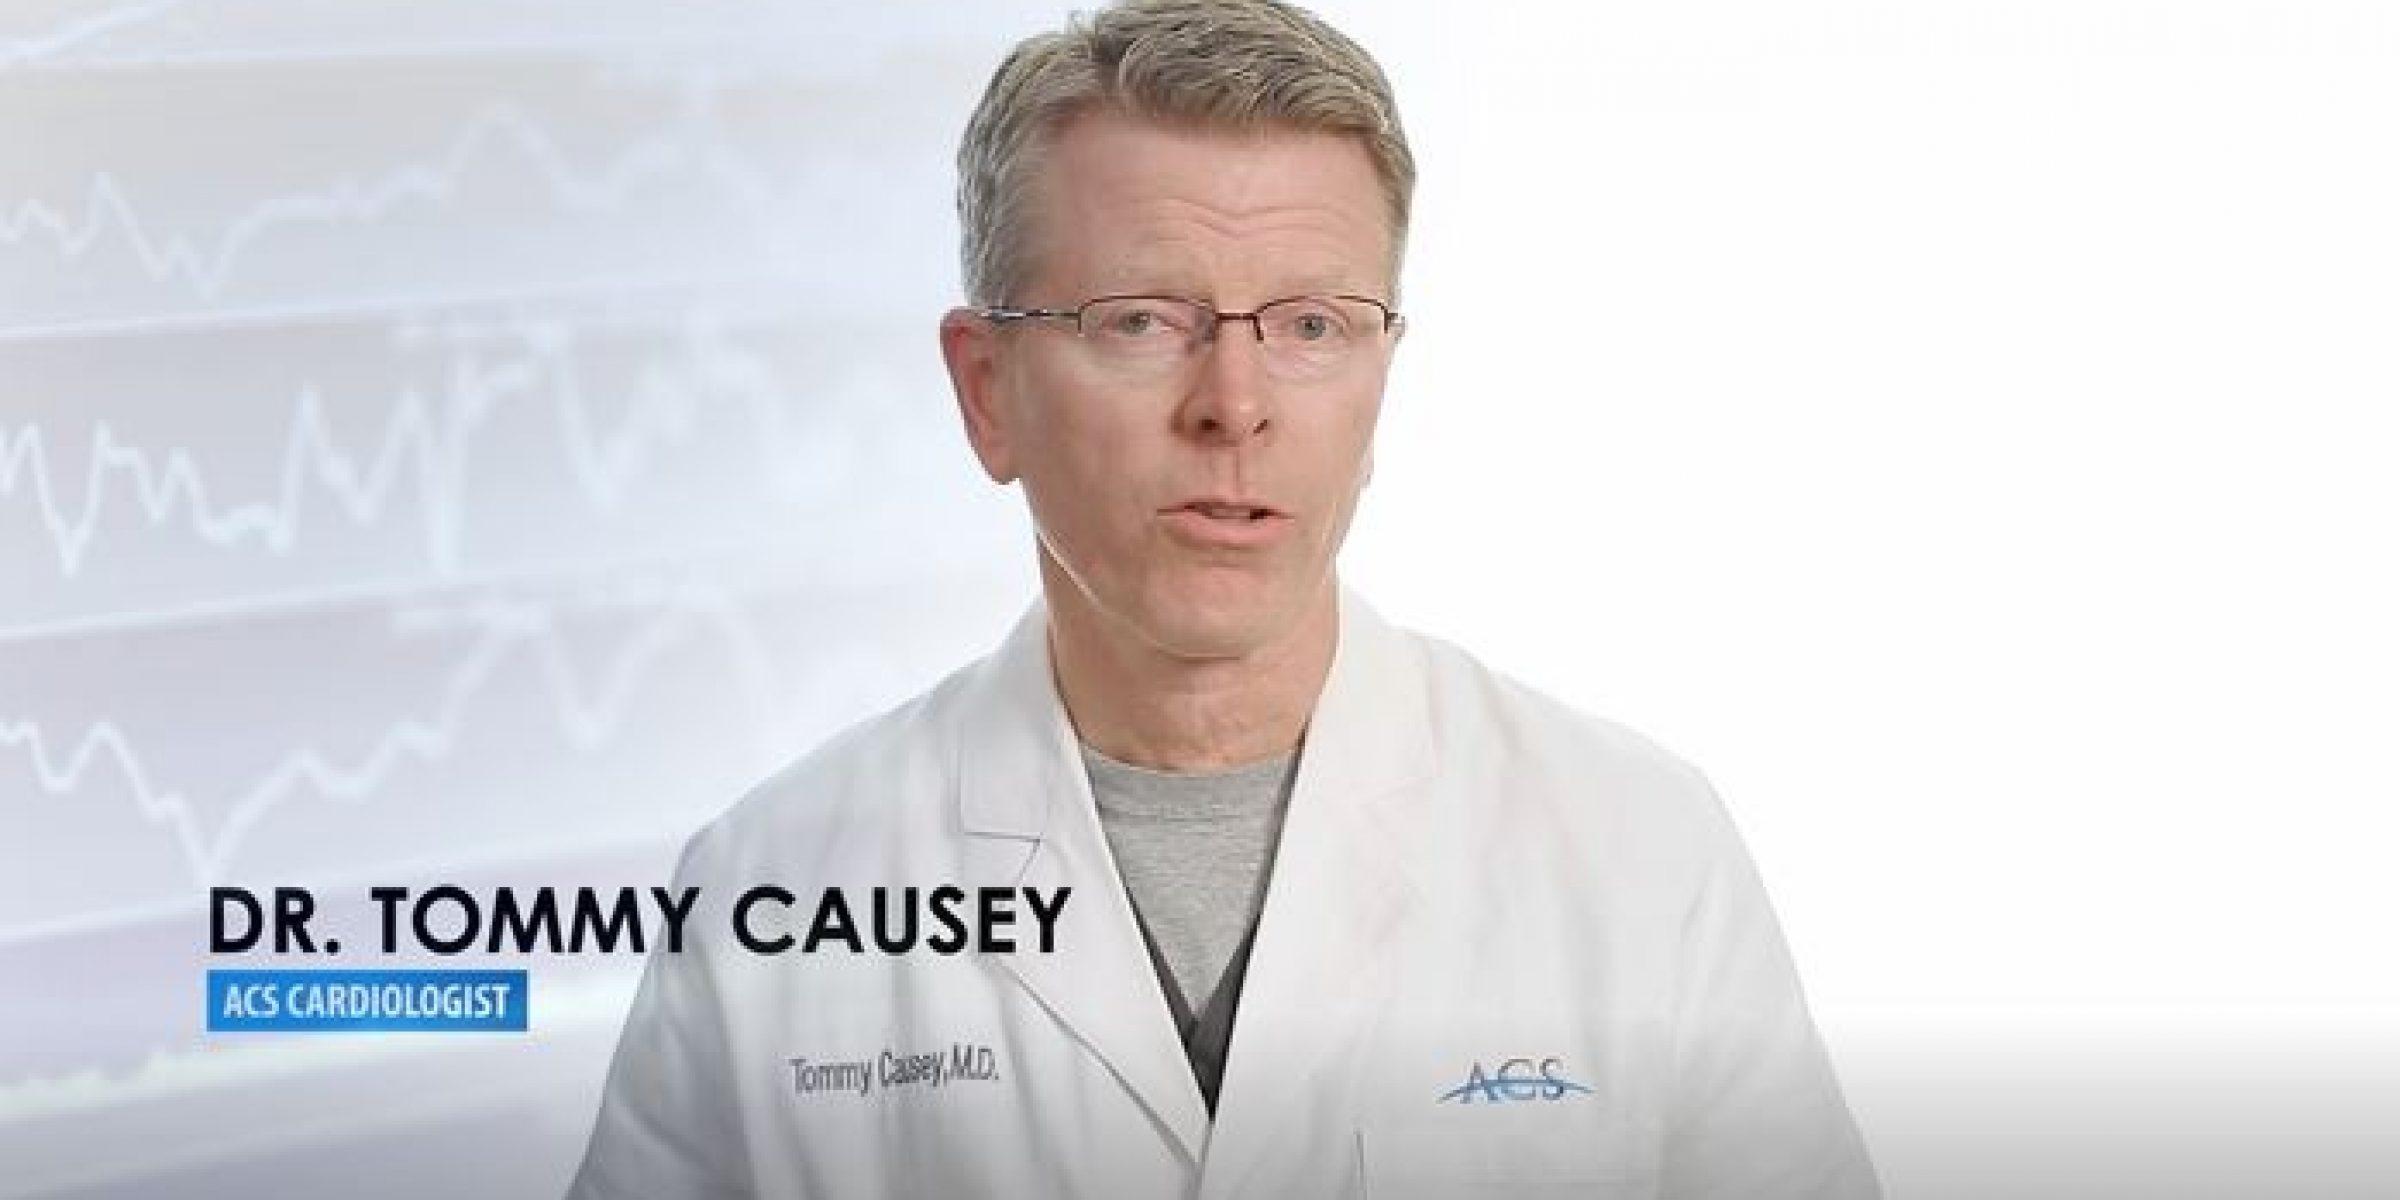 Heart pain, heart health, heart disease, cardiologist, Shreveport Cardiologist, Advanced Cardiovascular Specialists, Dr. Tommy Causey